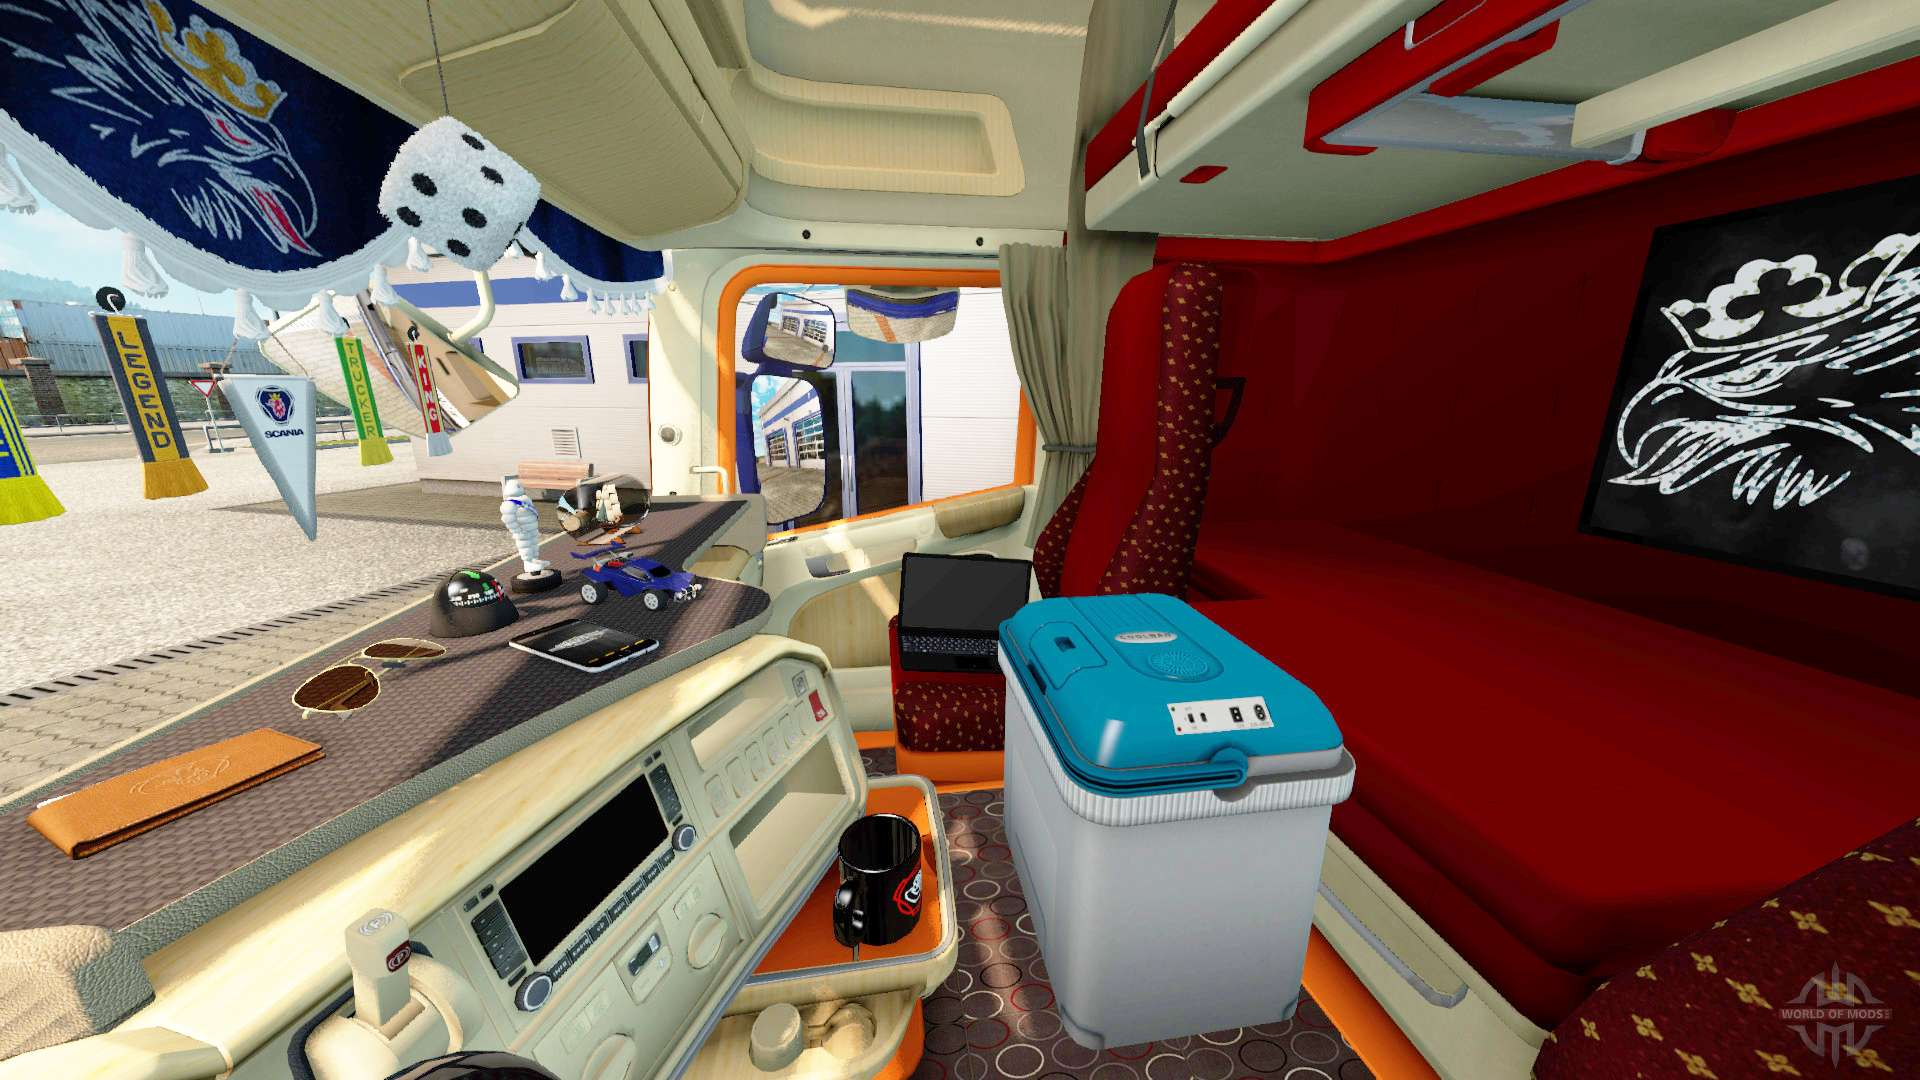 Interior for scania truck for euro truck simulator 2 for Interior decorating simulator